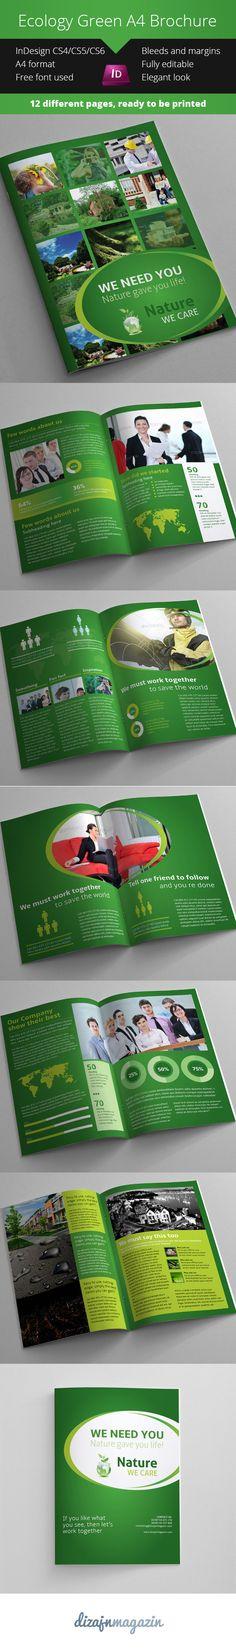 Free Nature Brochure A4 Format – InDesign Template   VrbicPlay - Creative studio